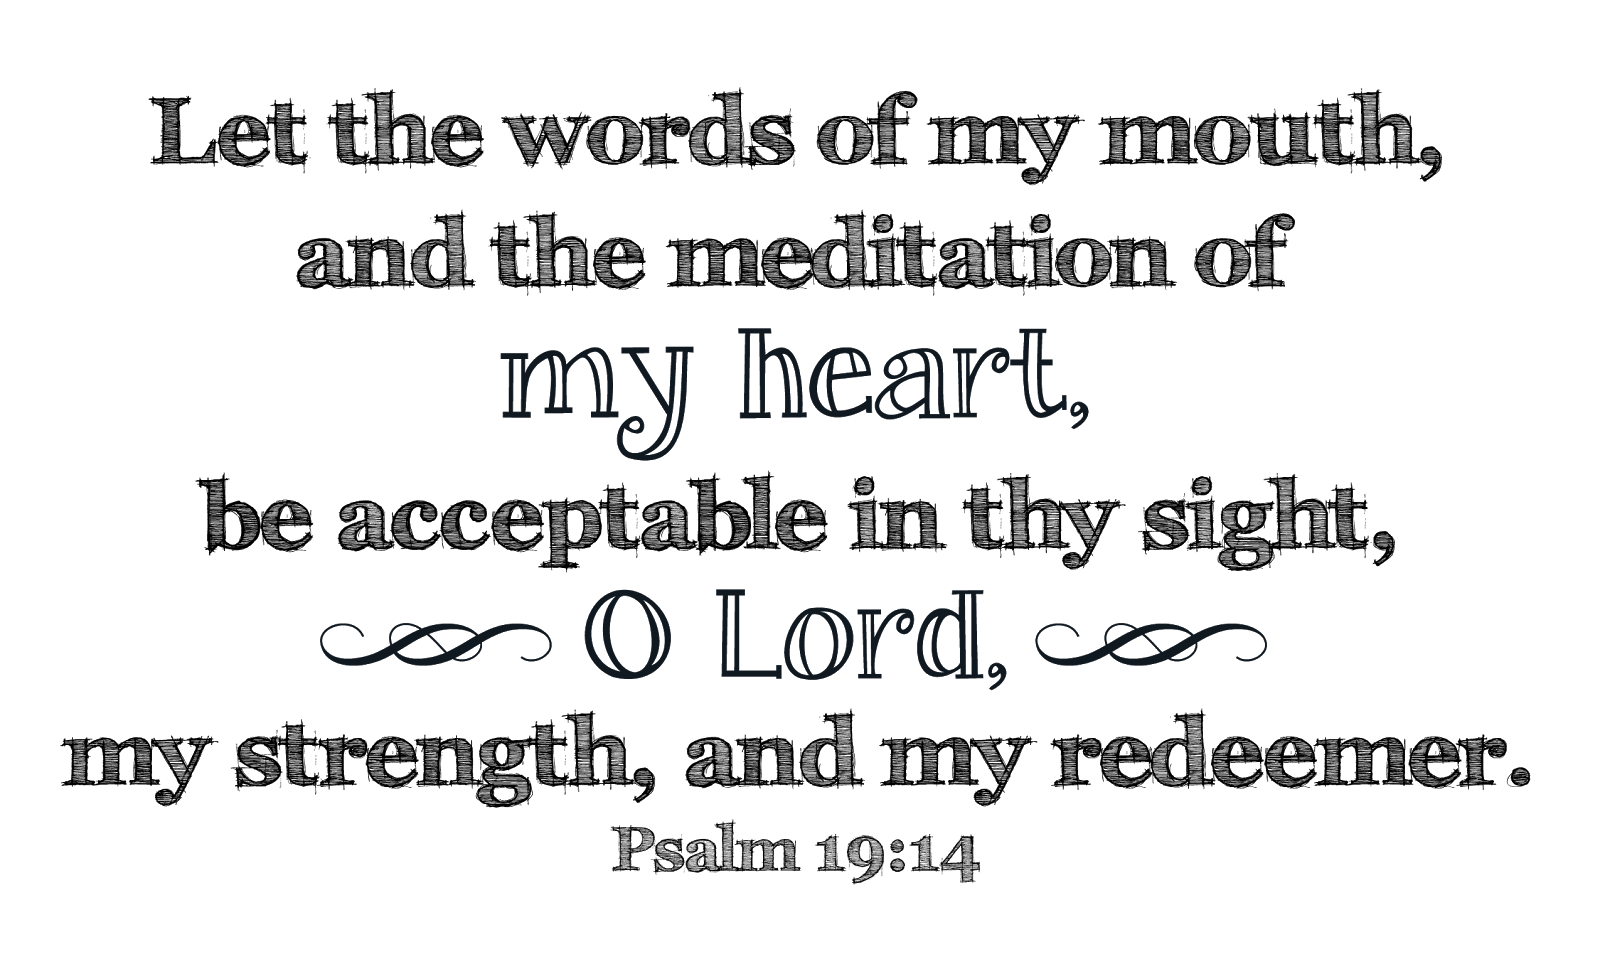 Astounding image for free printable scripture word art